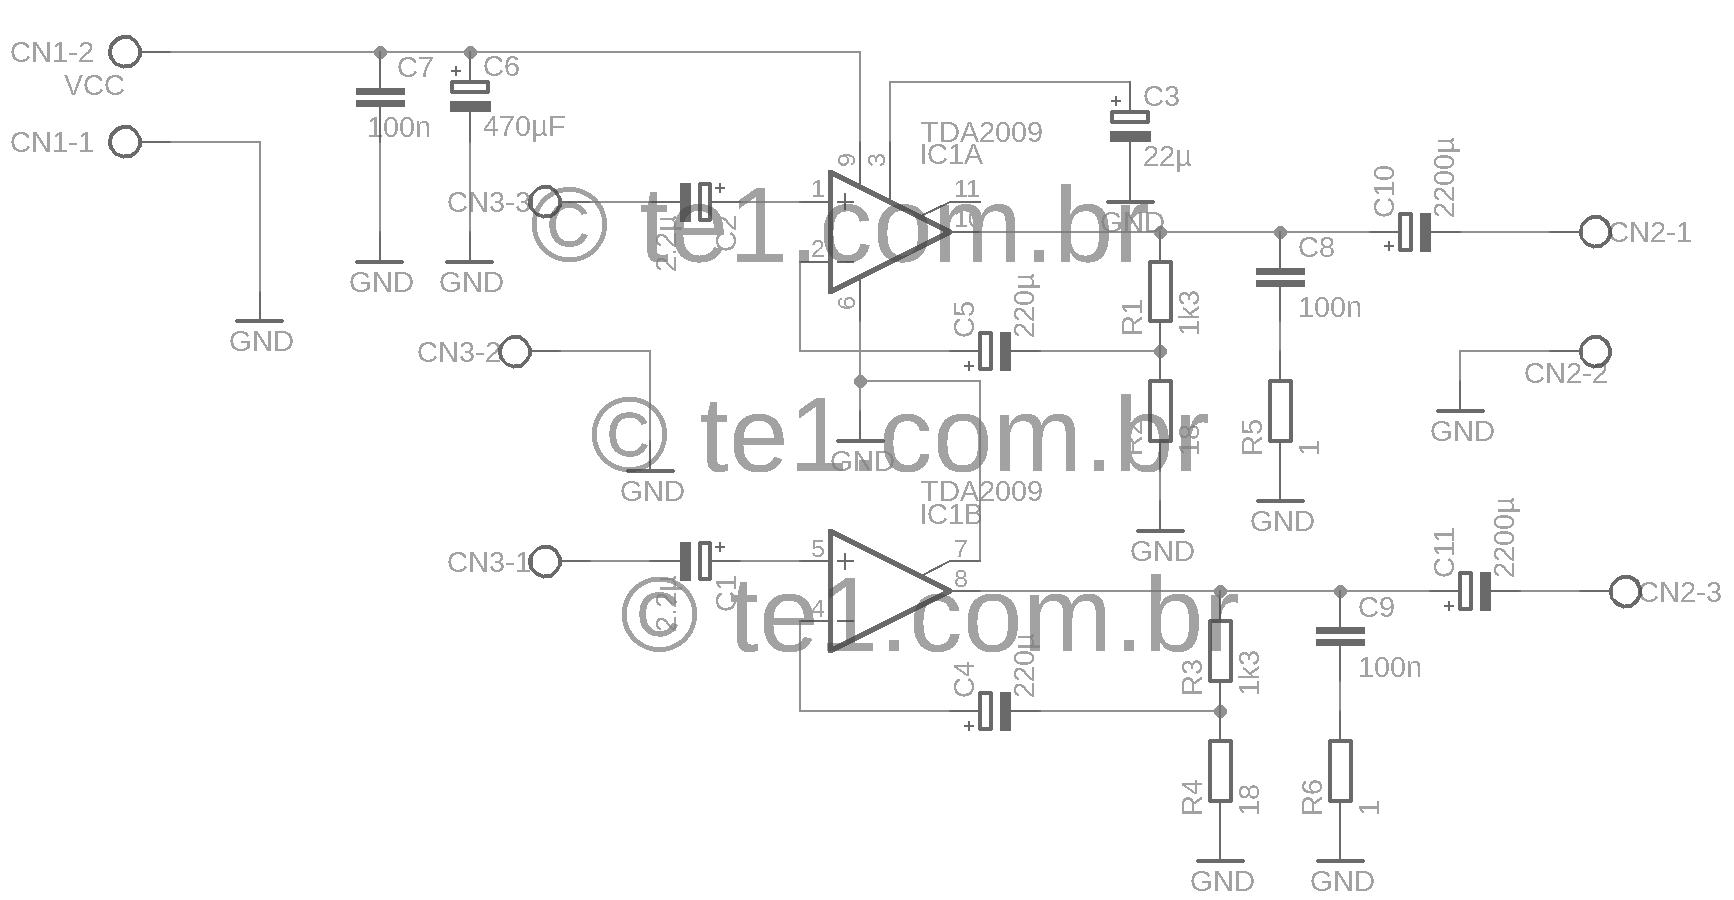 Toni Eletrnica One Circuitos E Informaes De Pgina 81 60 Watts Audio Amplifier Circuit Using Tda7296 Class Ab Tda2009 Stereo Amplificador Esquema 700x355 Circuito Potncia Estreo Com 2x 10w Tda